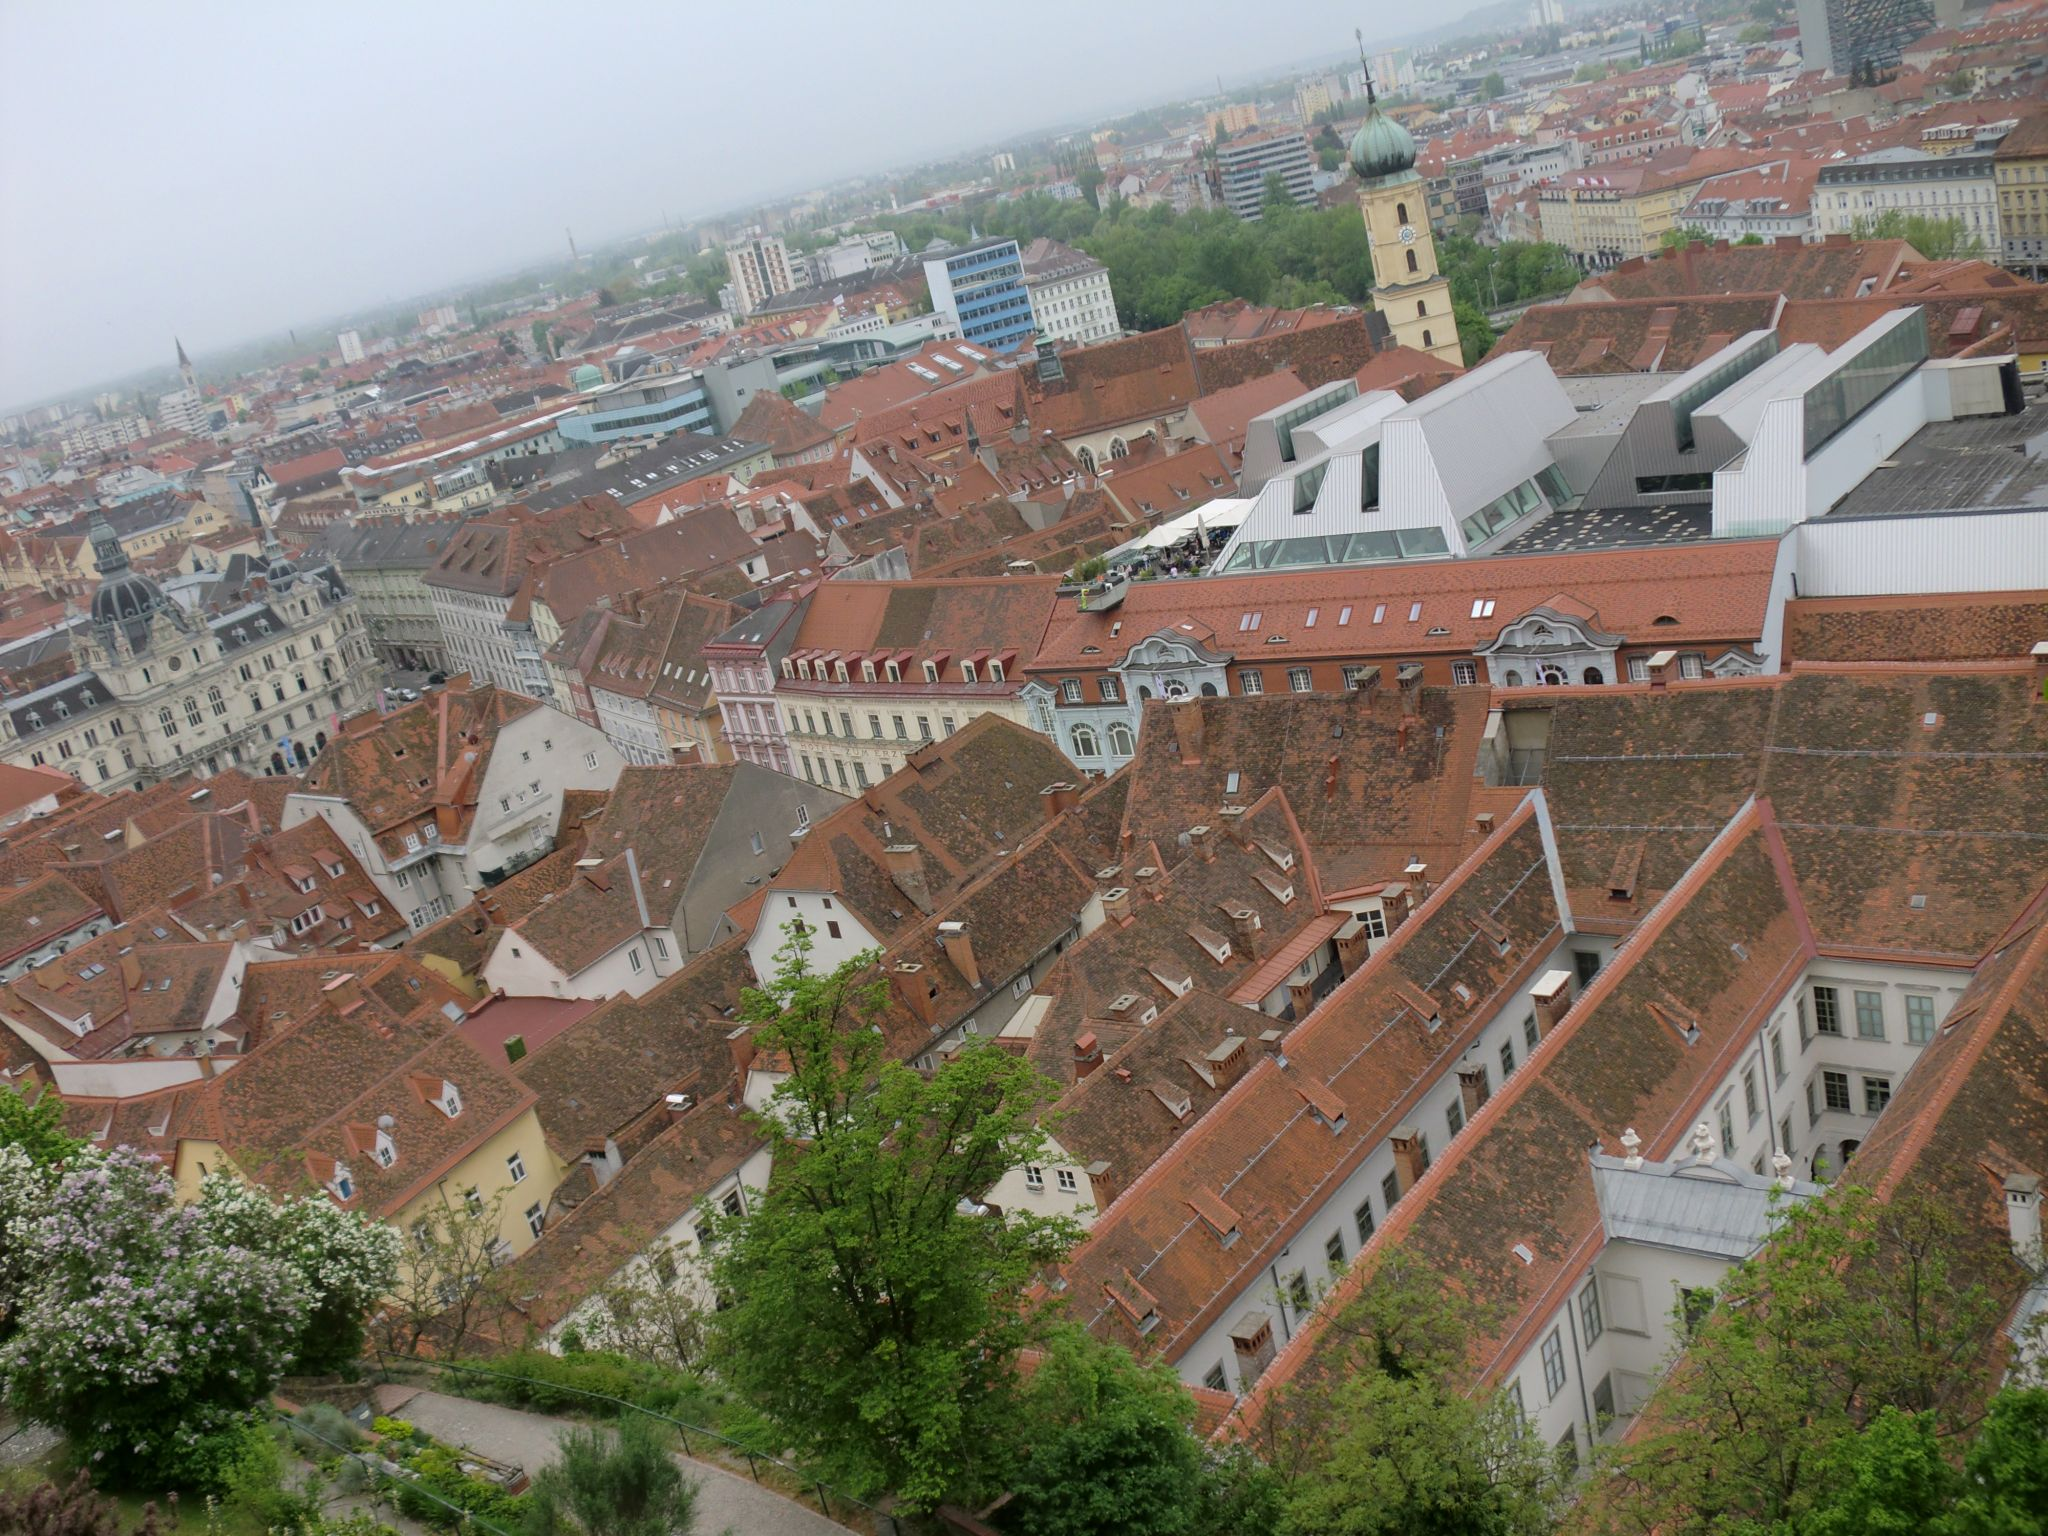 Graz view 8 - Graz: tradition and modernity